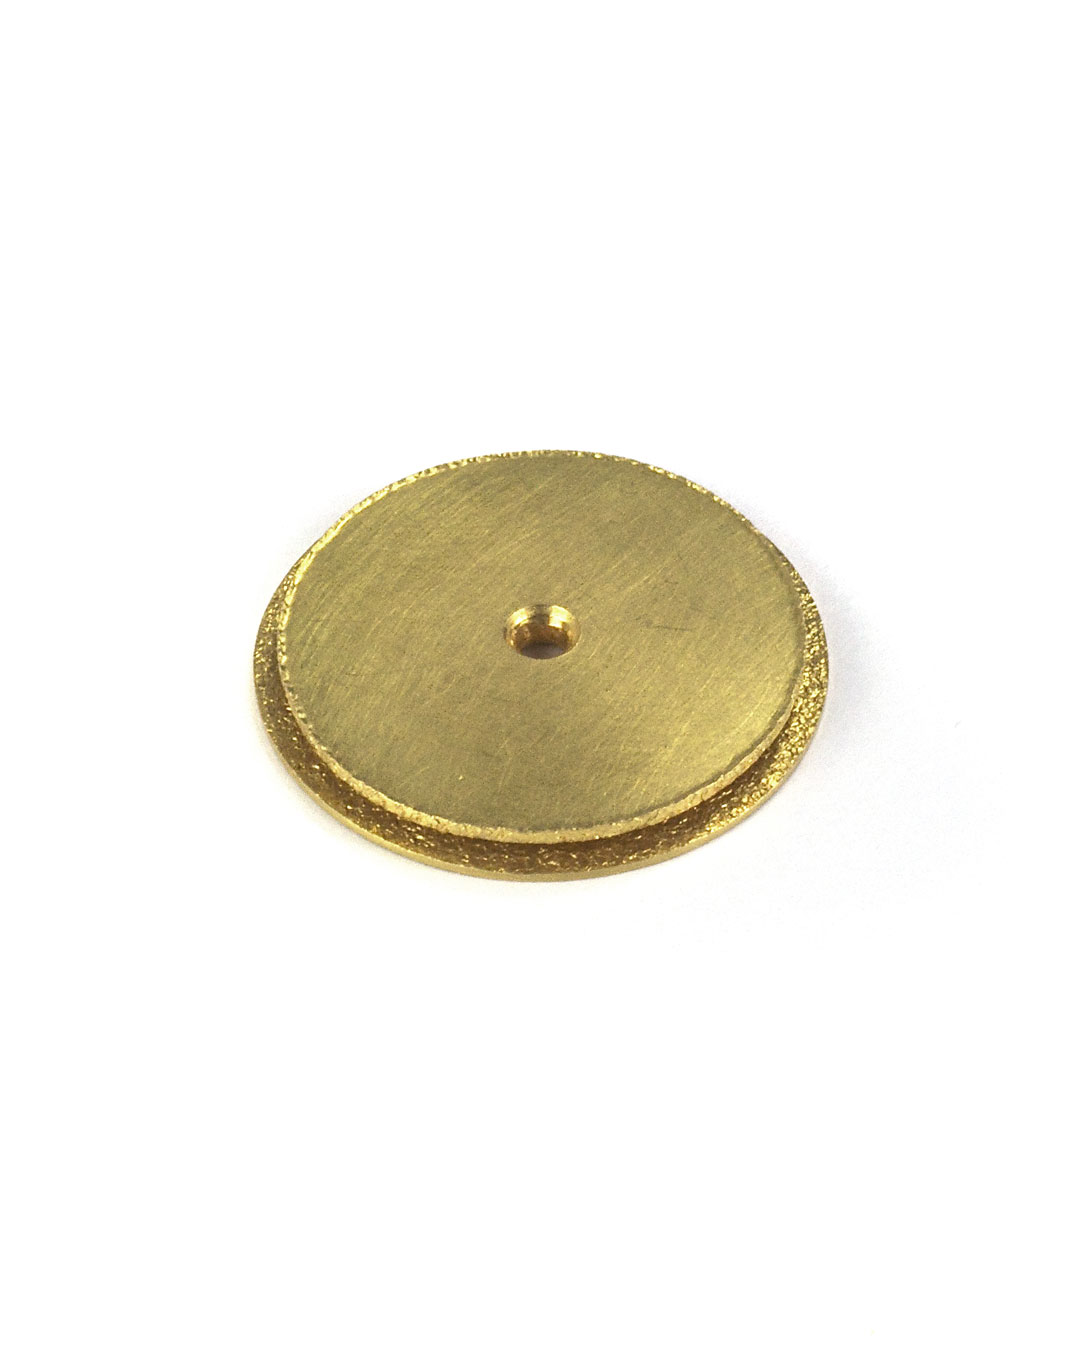 Okinari Kurokawa, untitled, 2002, pendant; 20ct gold, ø 21 x 3 mm, €980